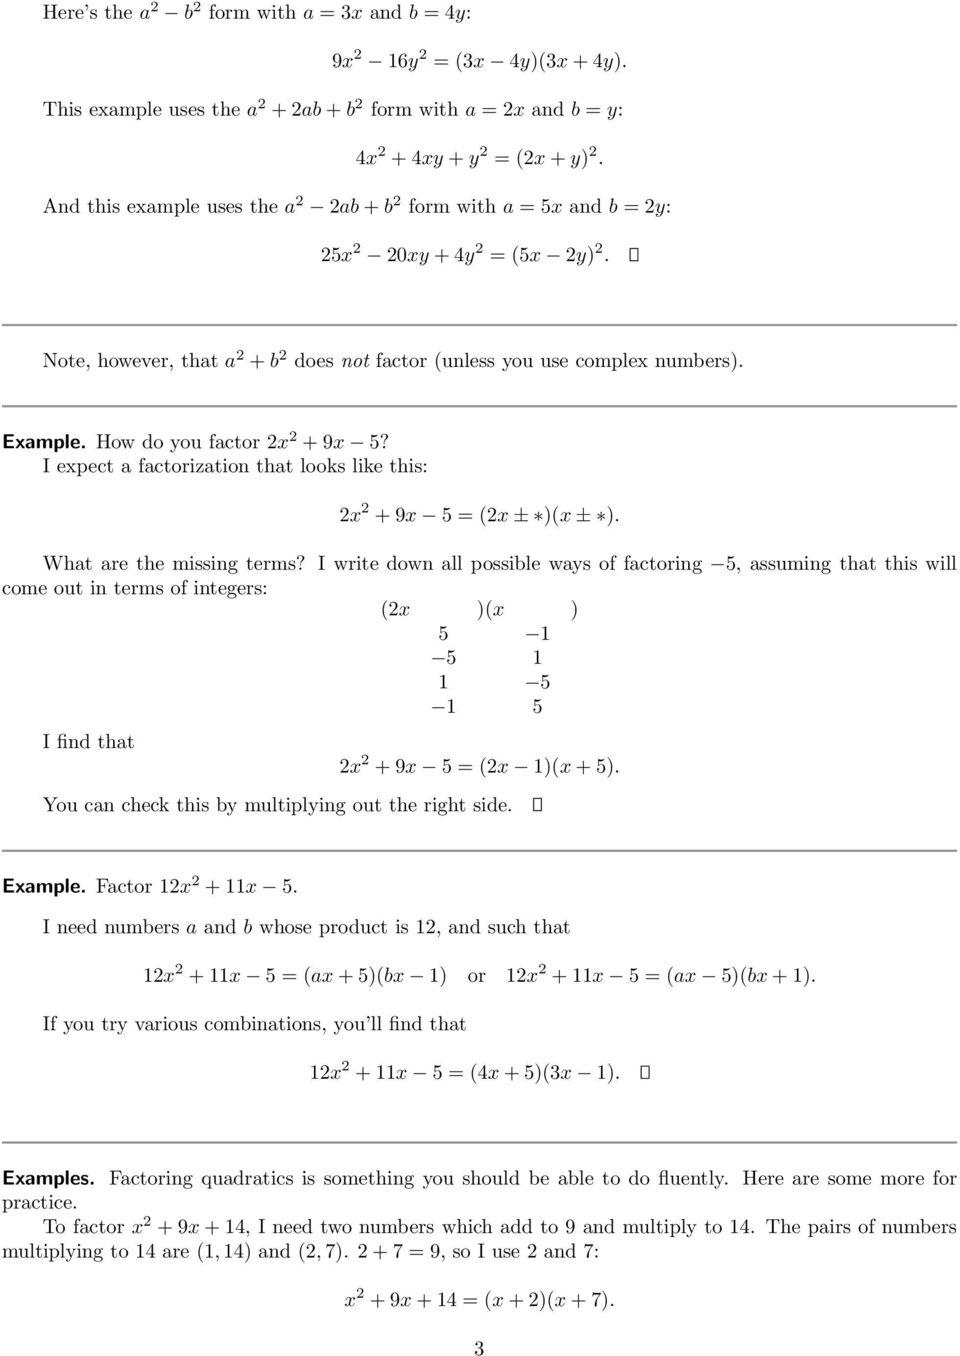 factoring polynomials pdf free download